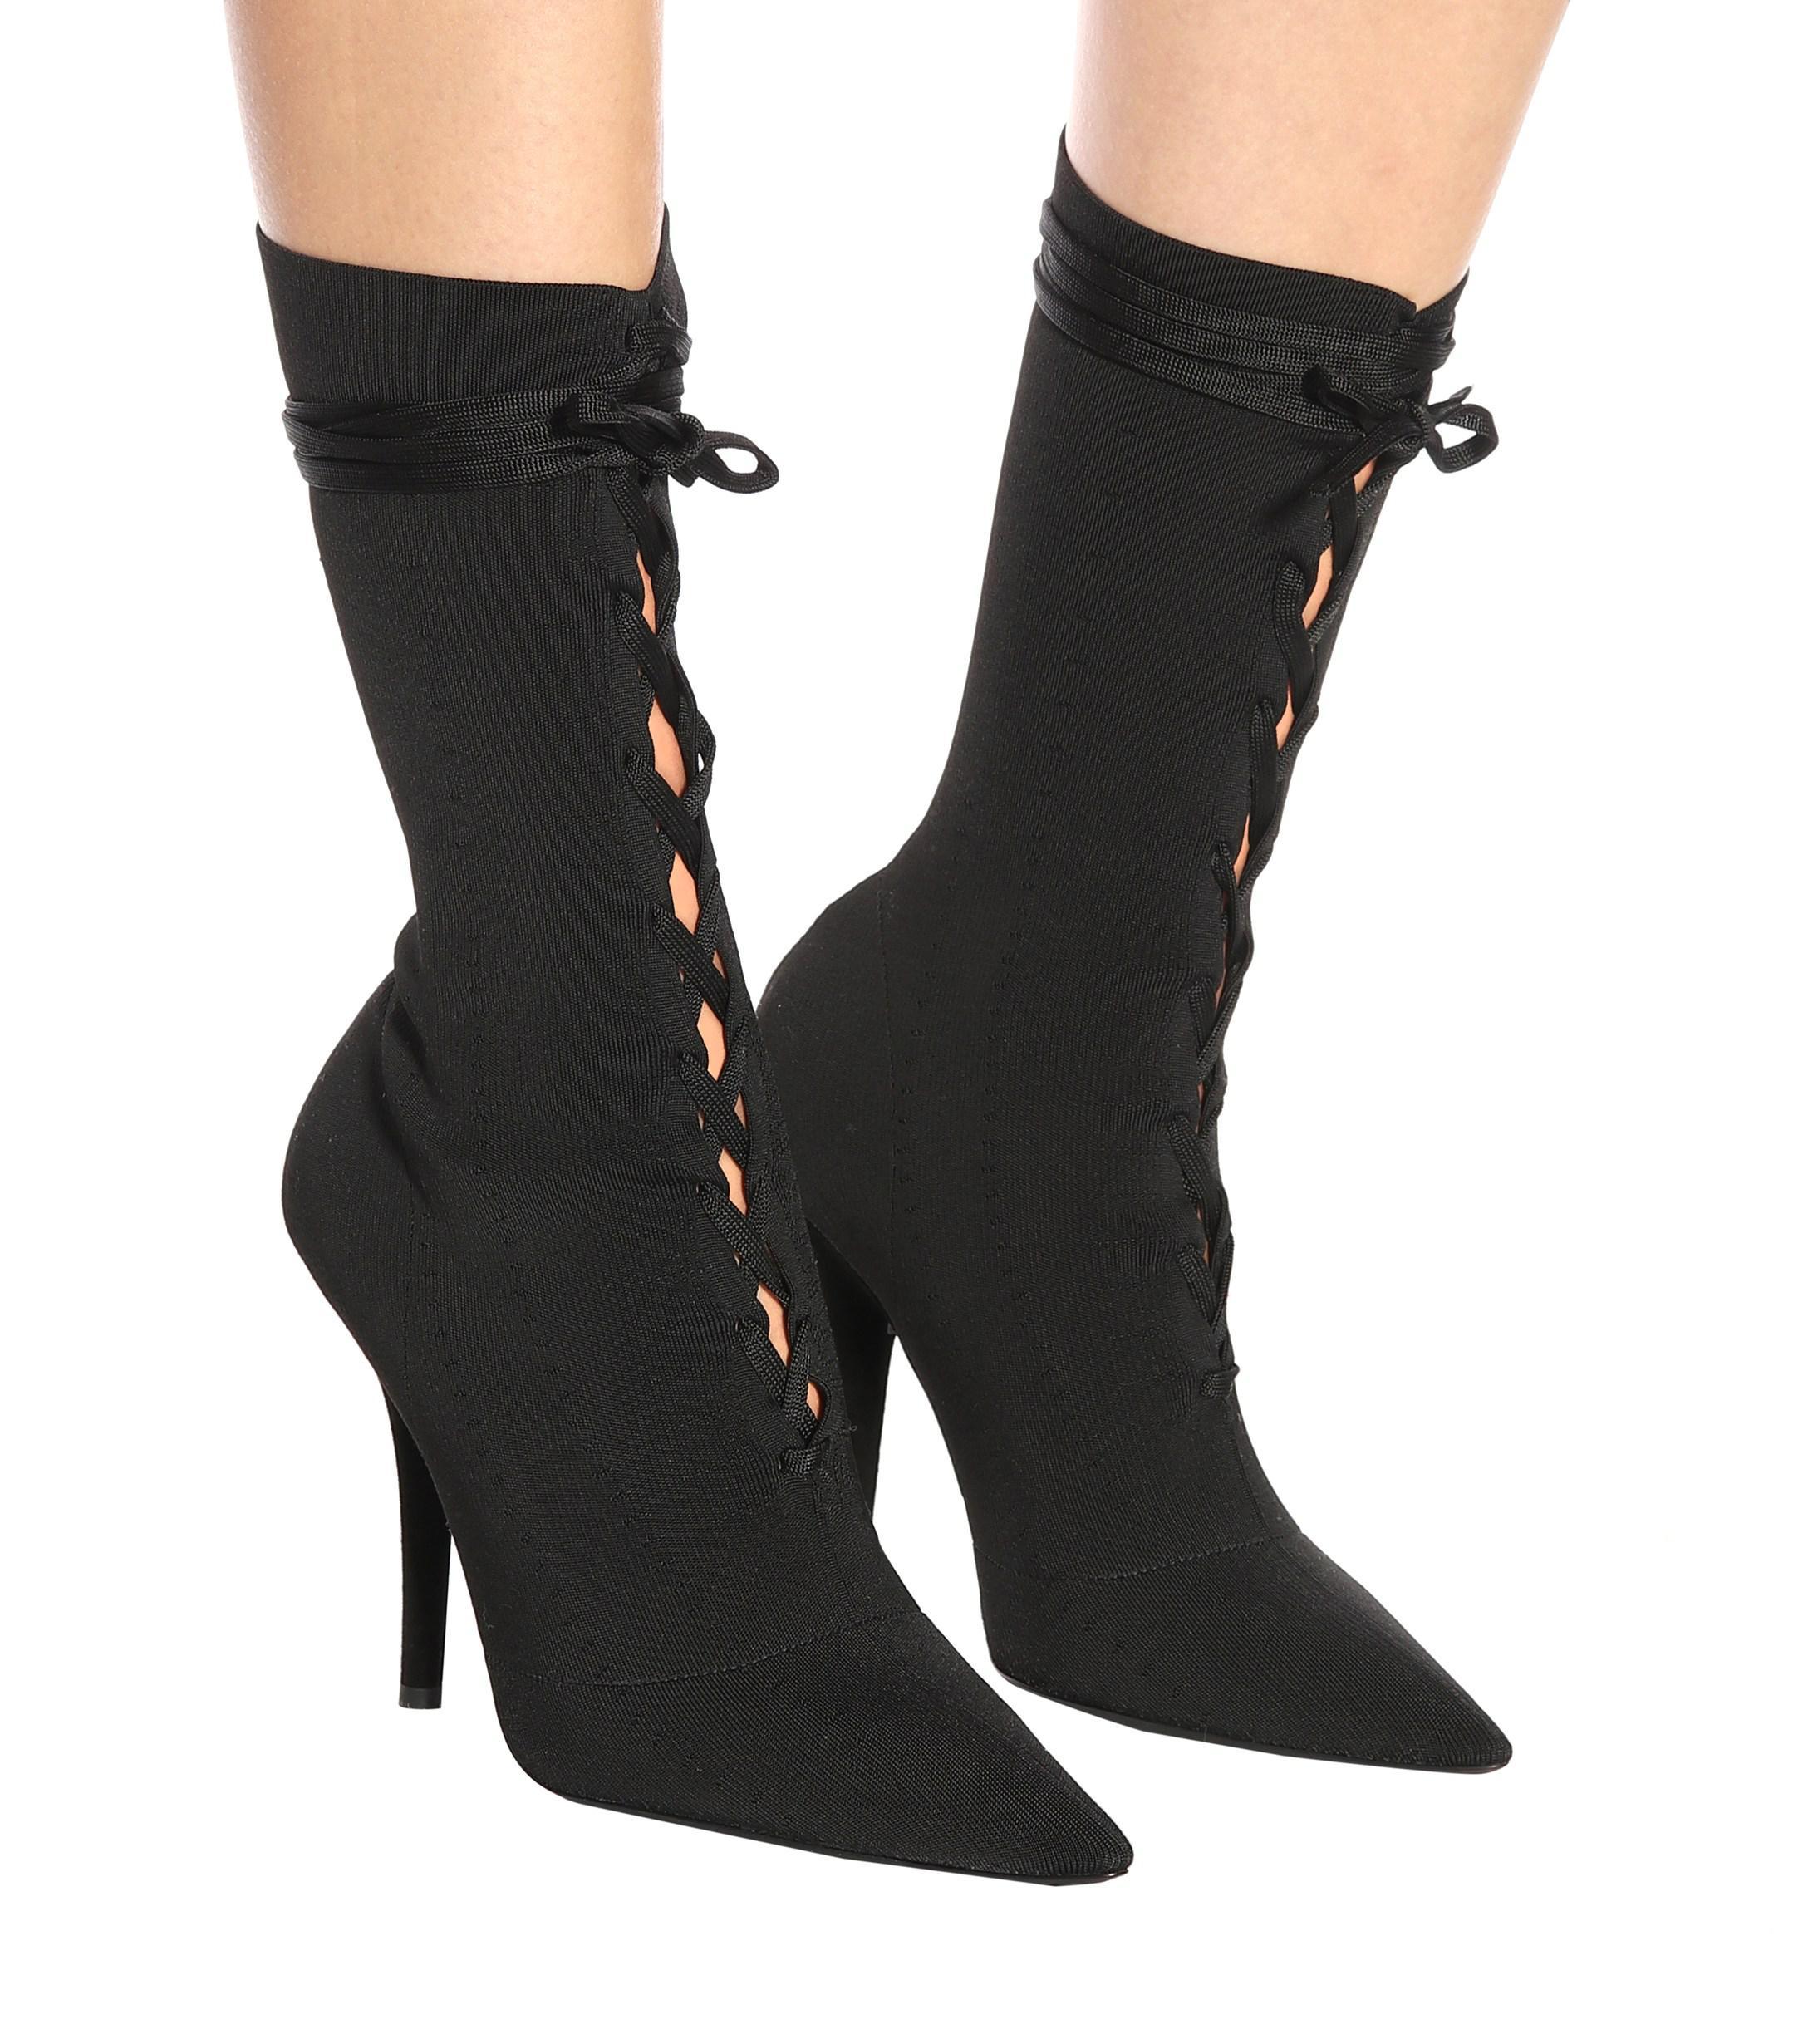 92fd25134ea4 Yeezy - Black Lace-up Knit Ankle Boots (season 5) - Lyst. View fullscreen